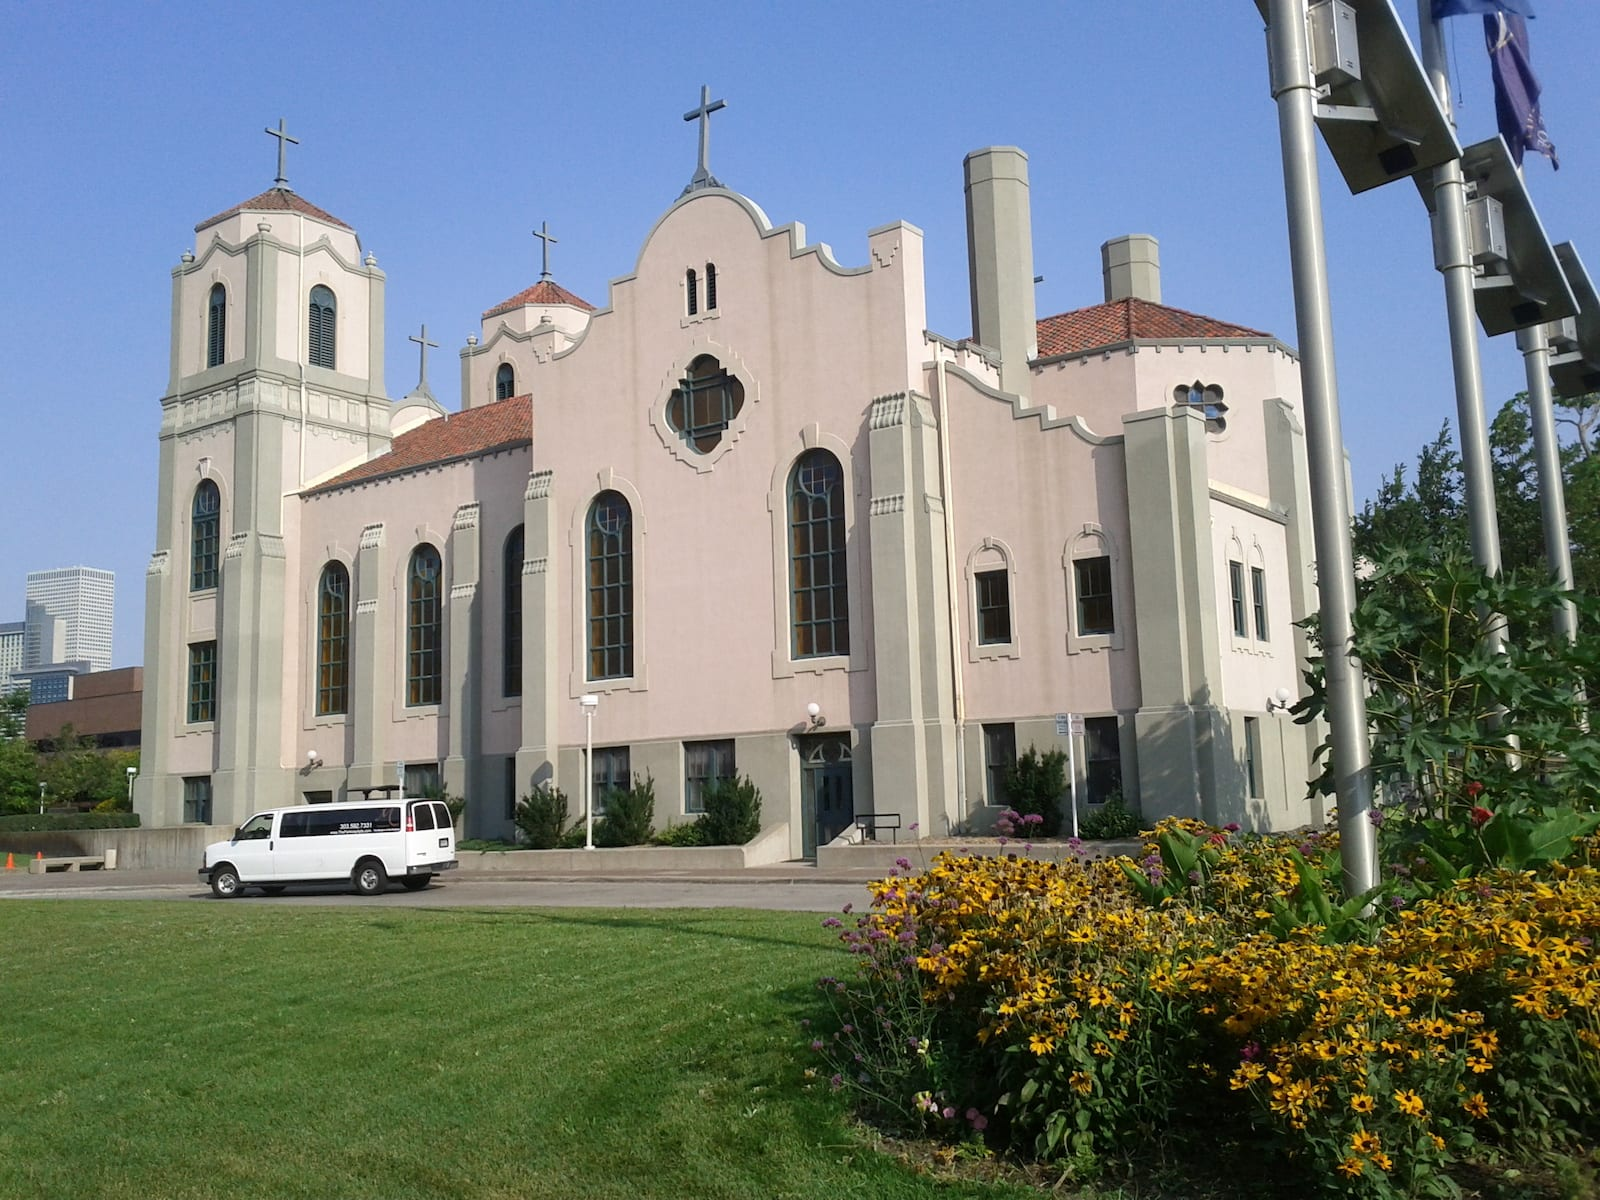 Auraria Neighborhood Denver CO St Cajetan Catholic Church